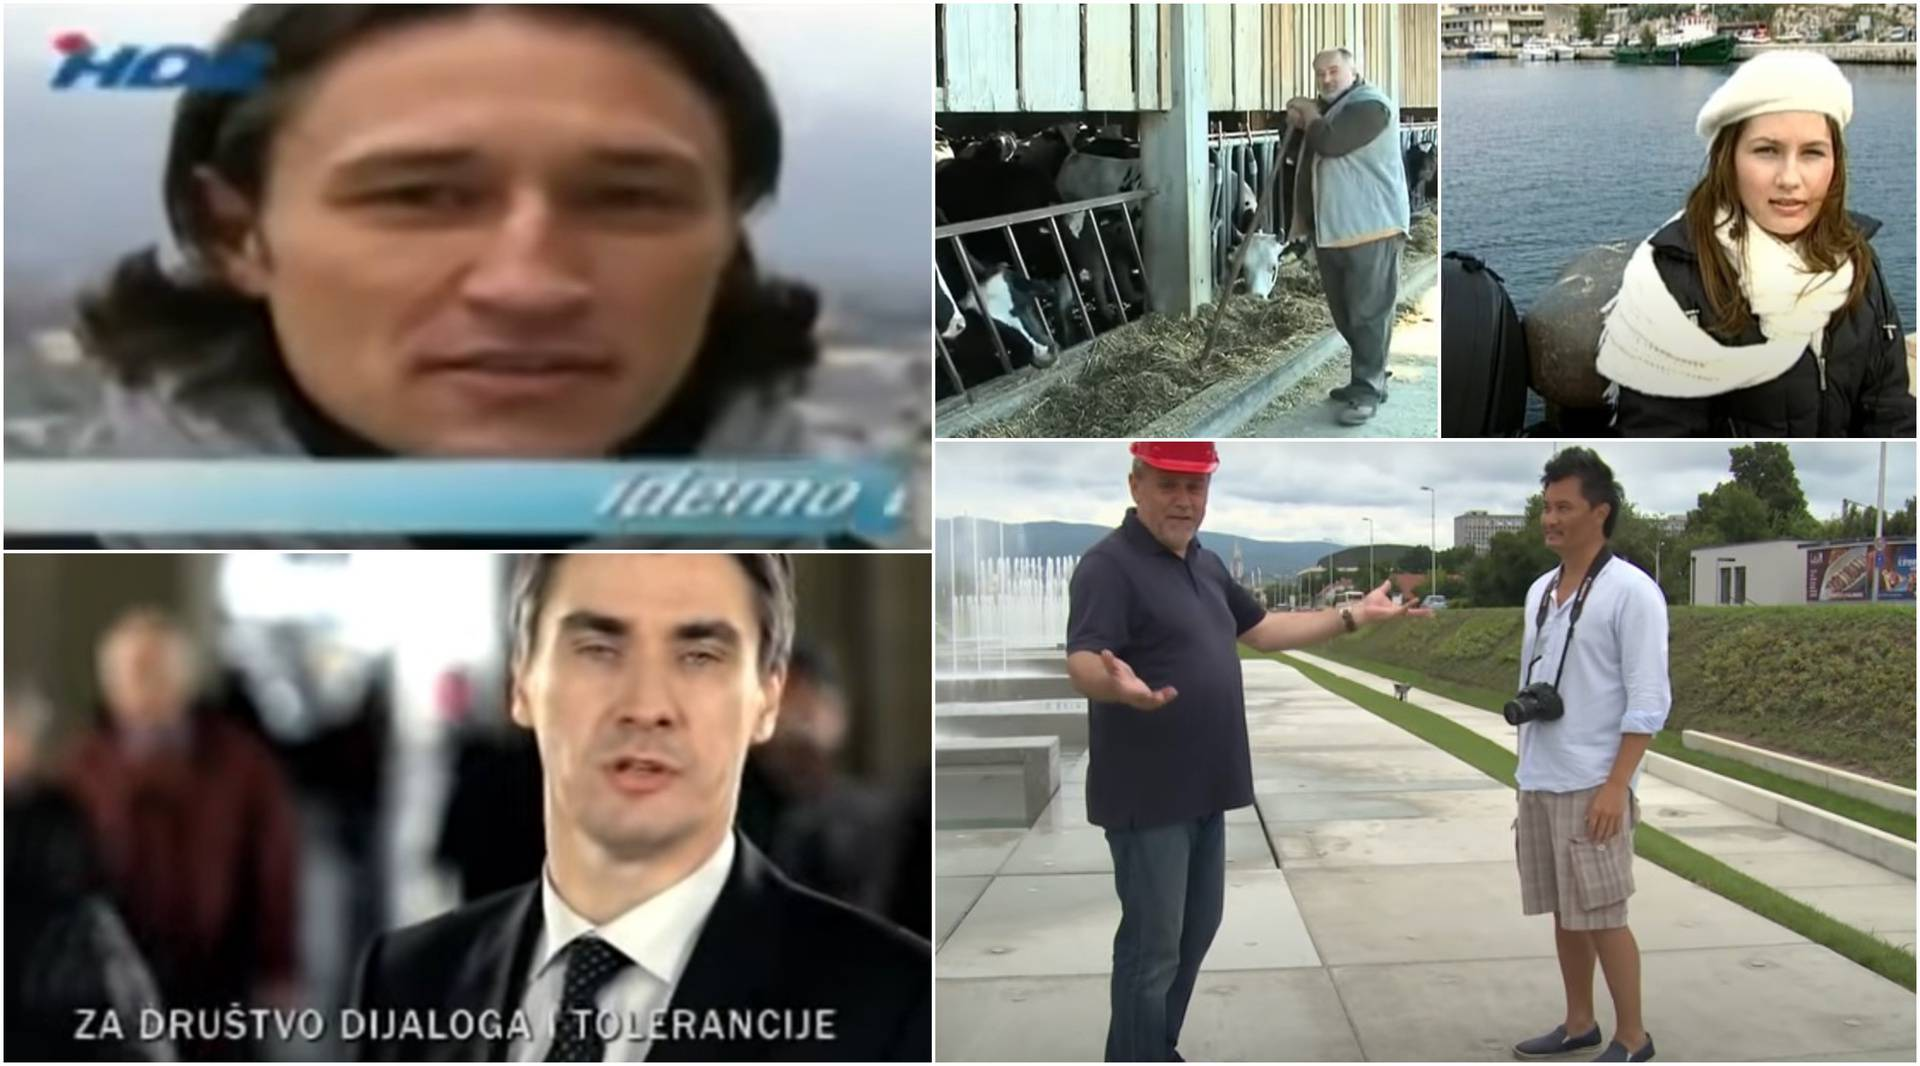 'Moj brat Robert Također':  Top 15 bizarnih izbornih spotova...